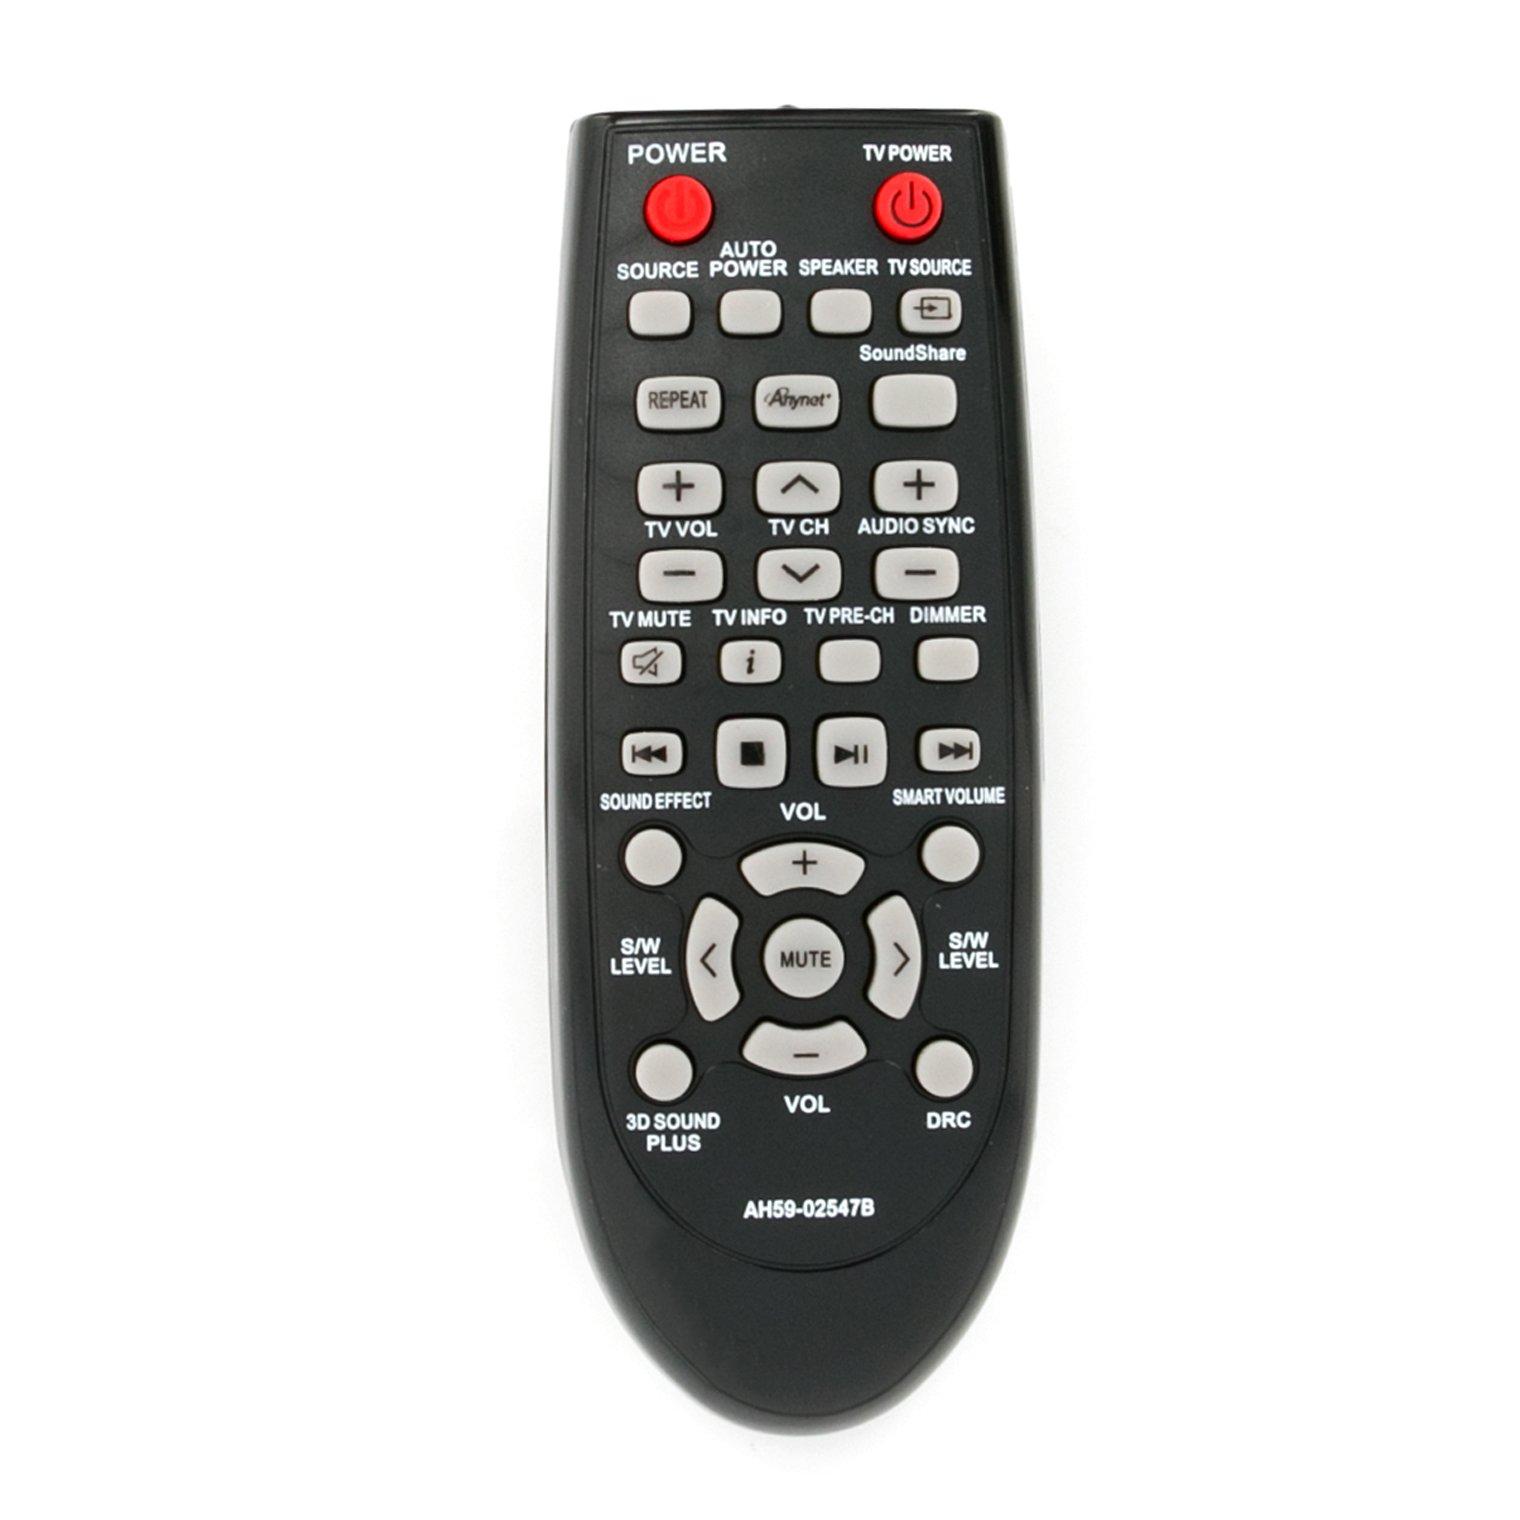 Control Remoto AH59 02547B Soundbar Samsung Sound Bar AH6...